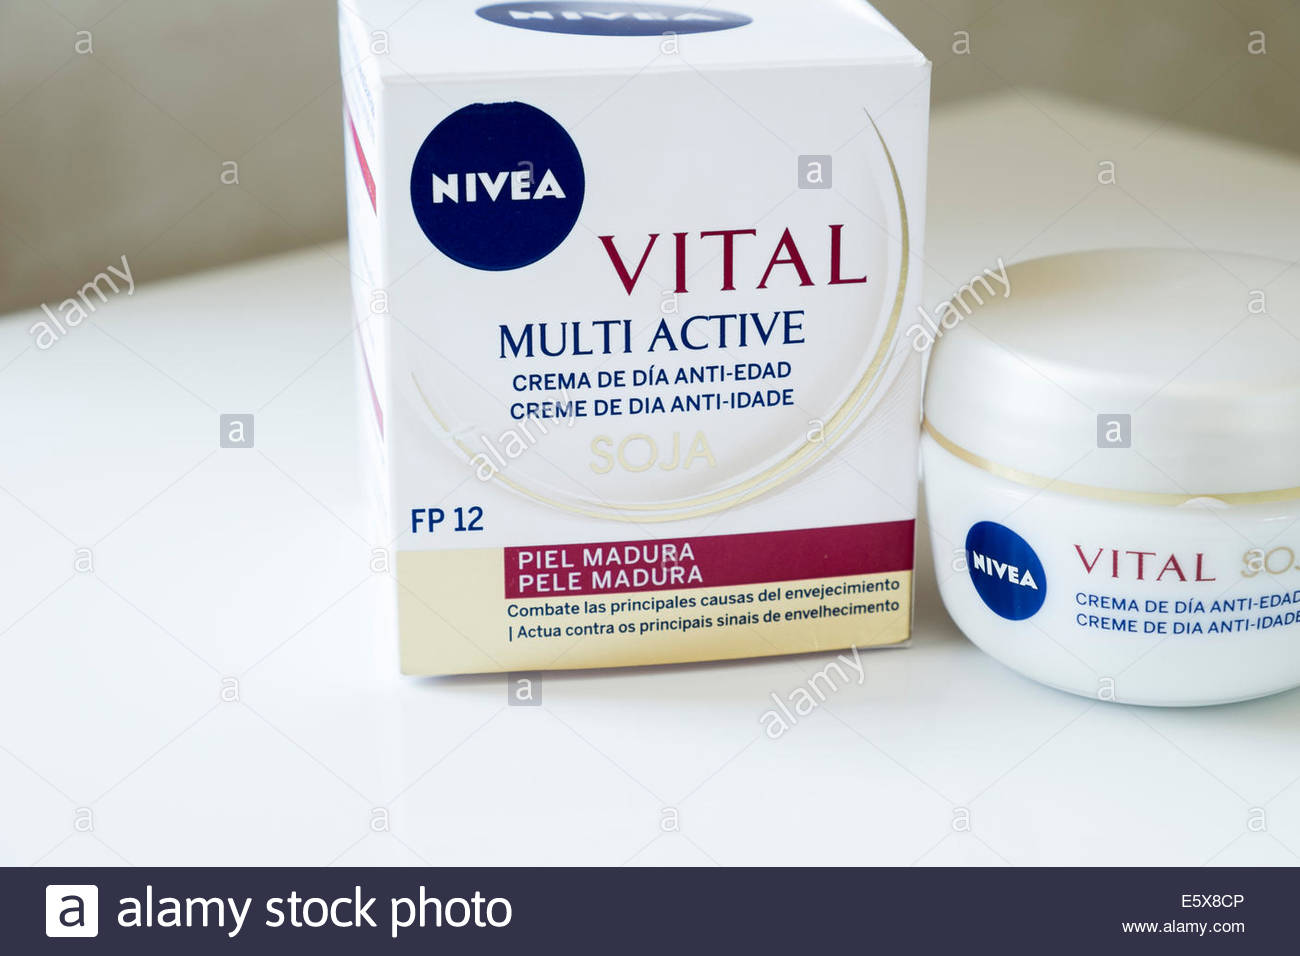 Nivea Vital soja moisturising day cream as sold in Portugal with box Stock Photo